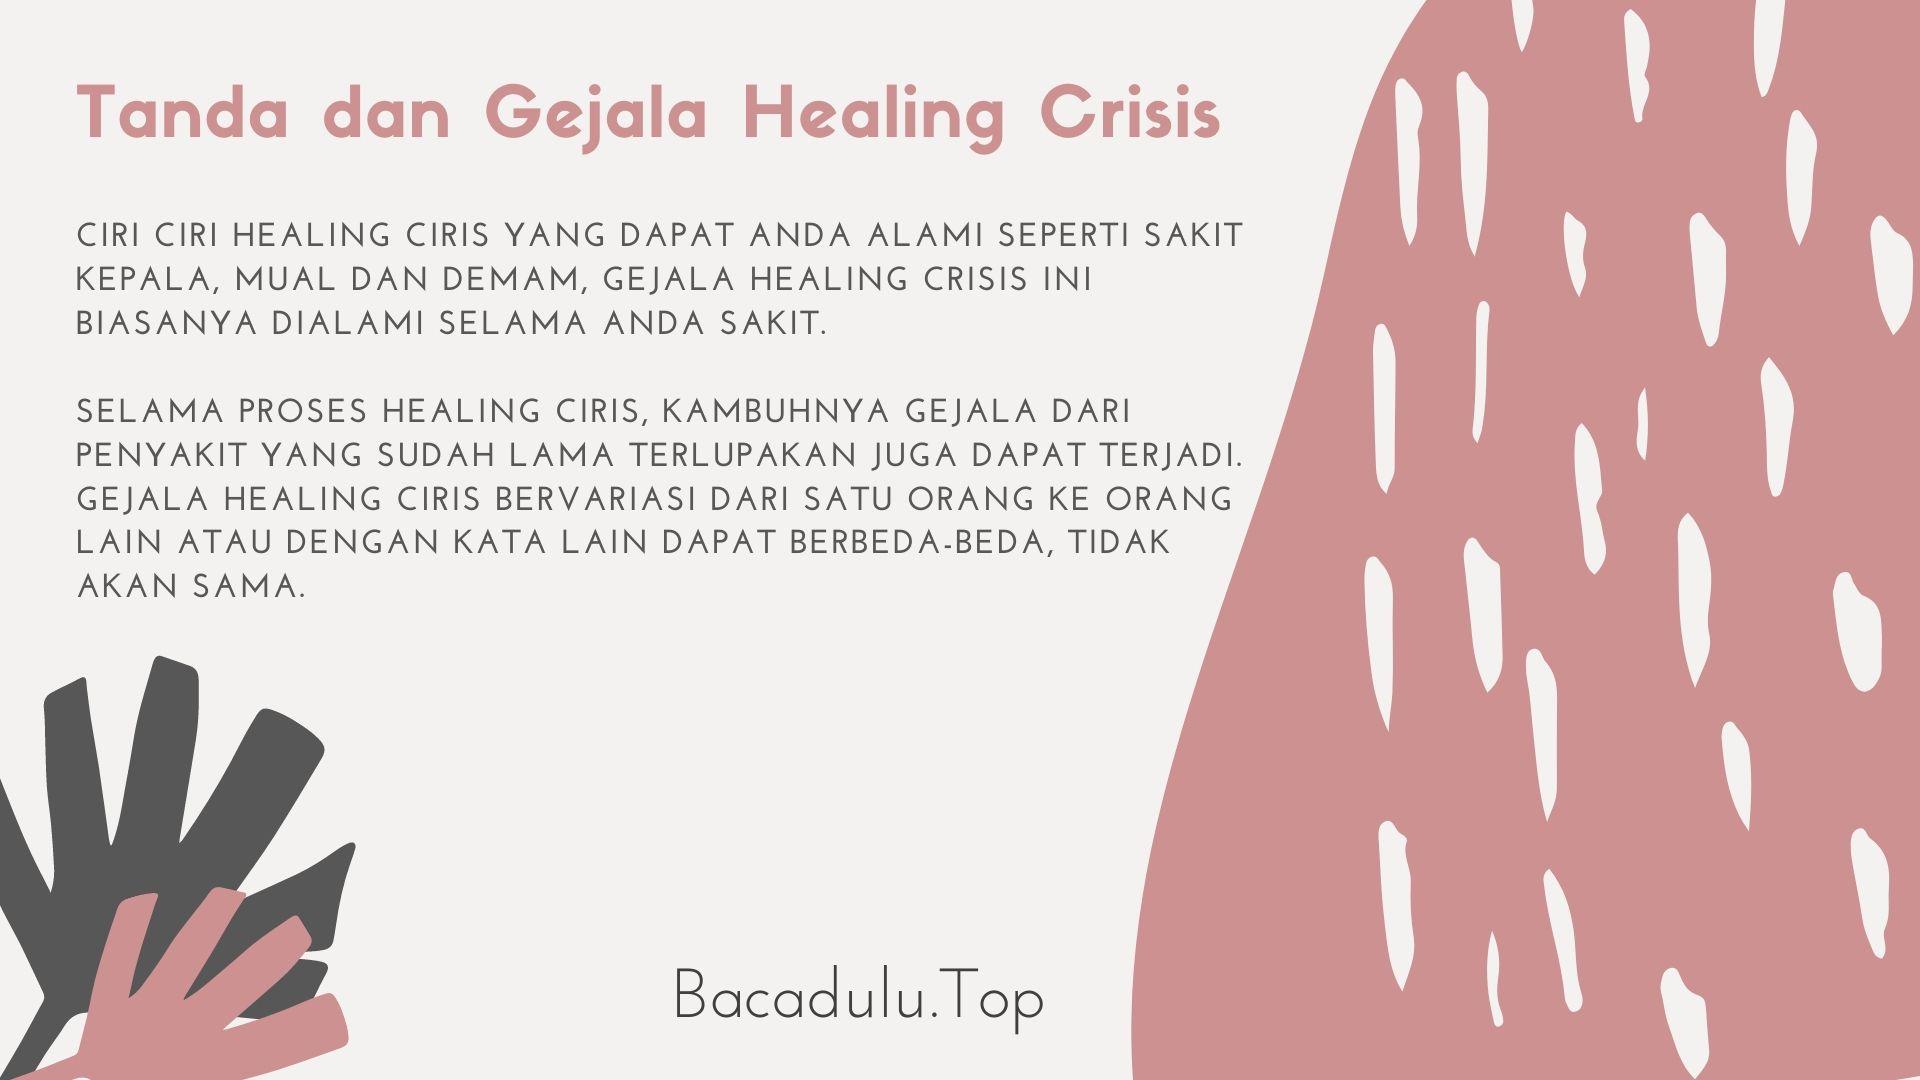 Tanda dan Gejala Healing Crisis